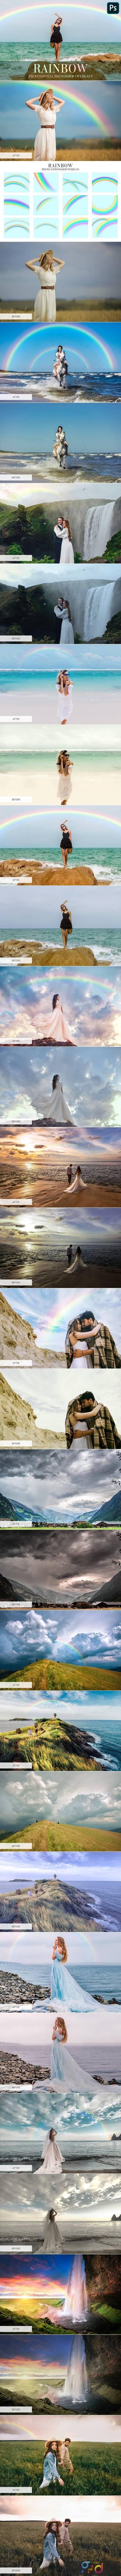 Rainbow Overlays Photoshop 4940455 1